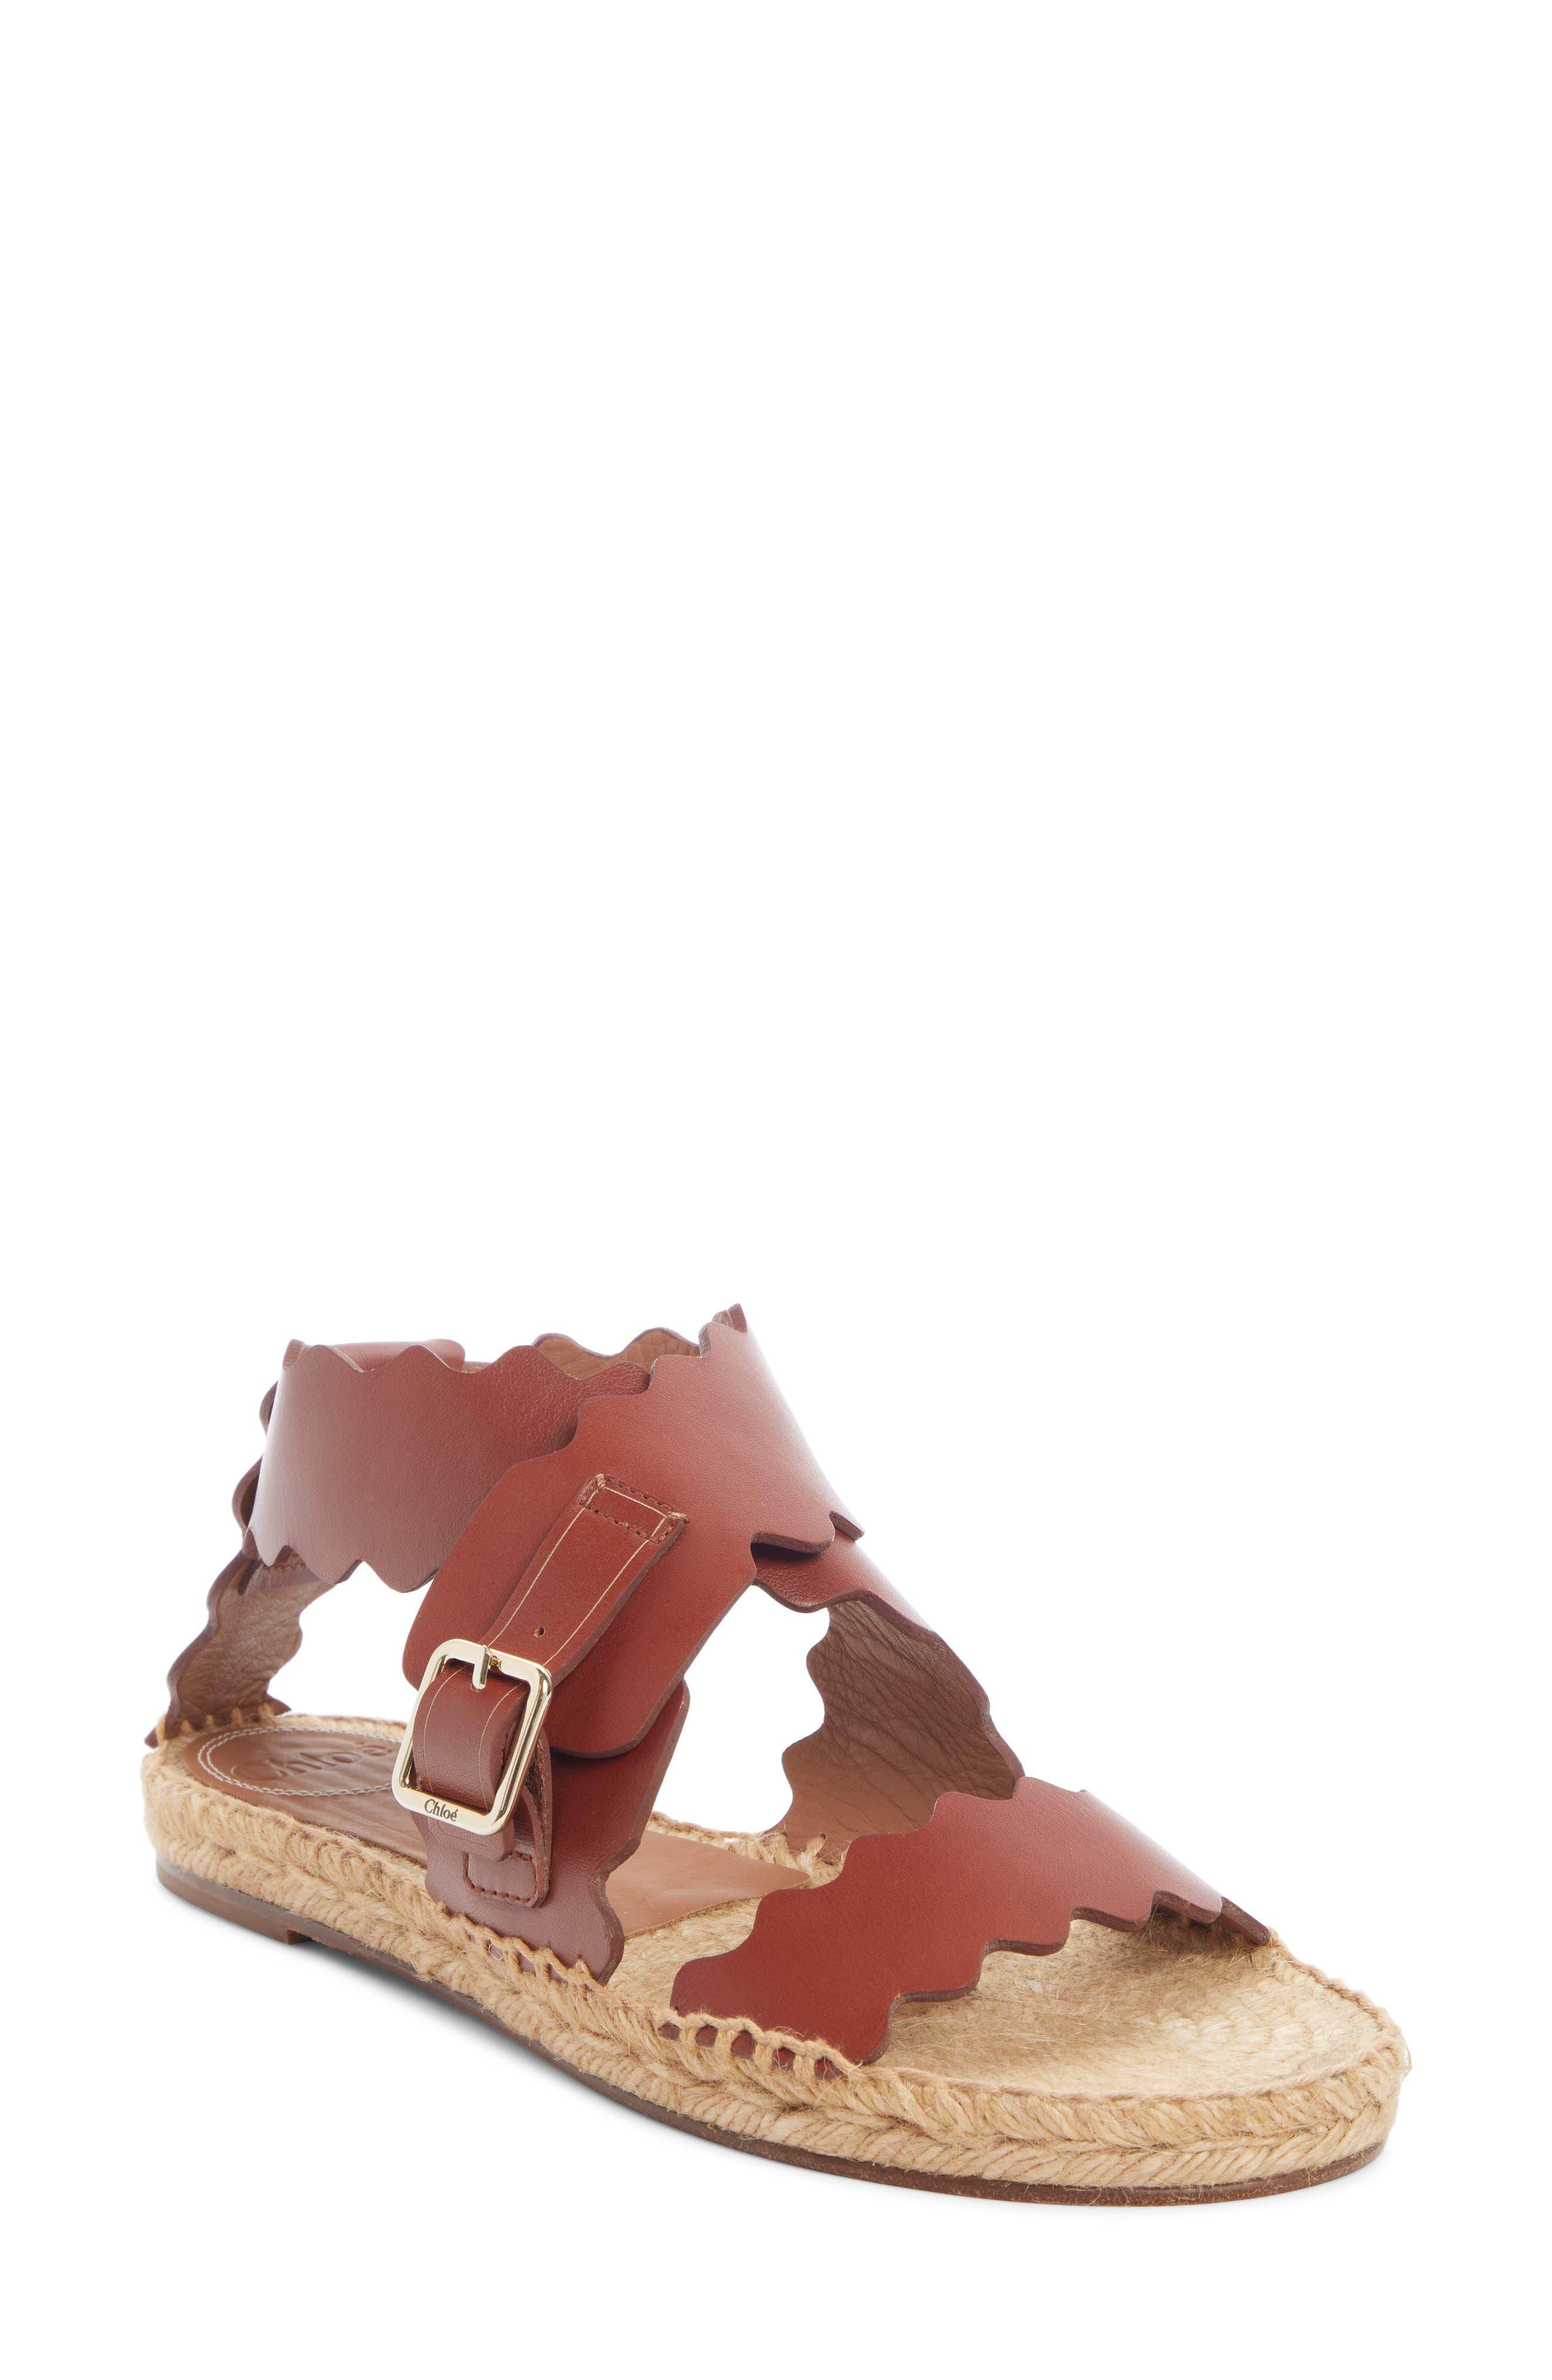 Women's Sandals Sale Designer Collections